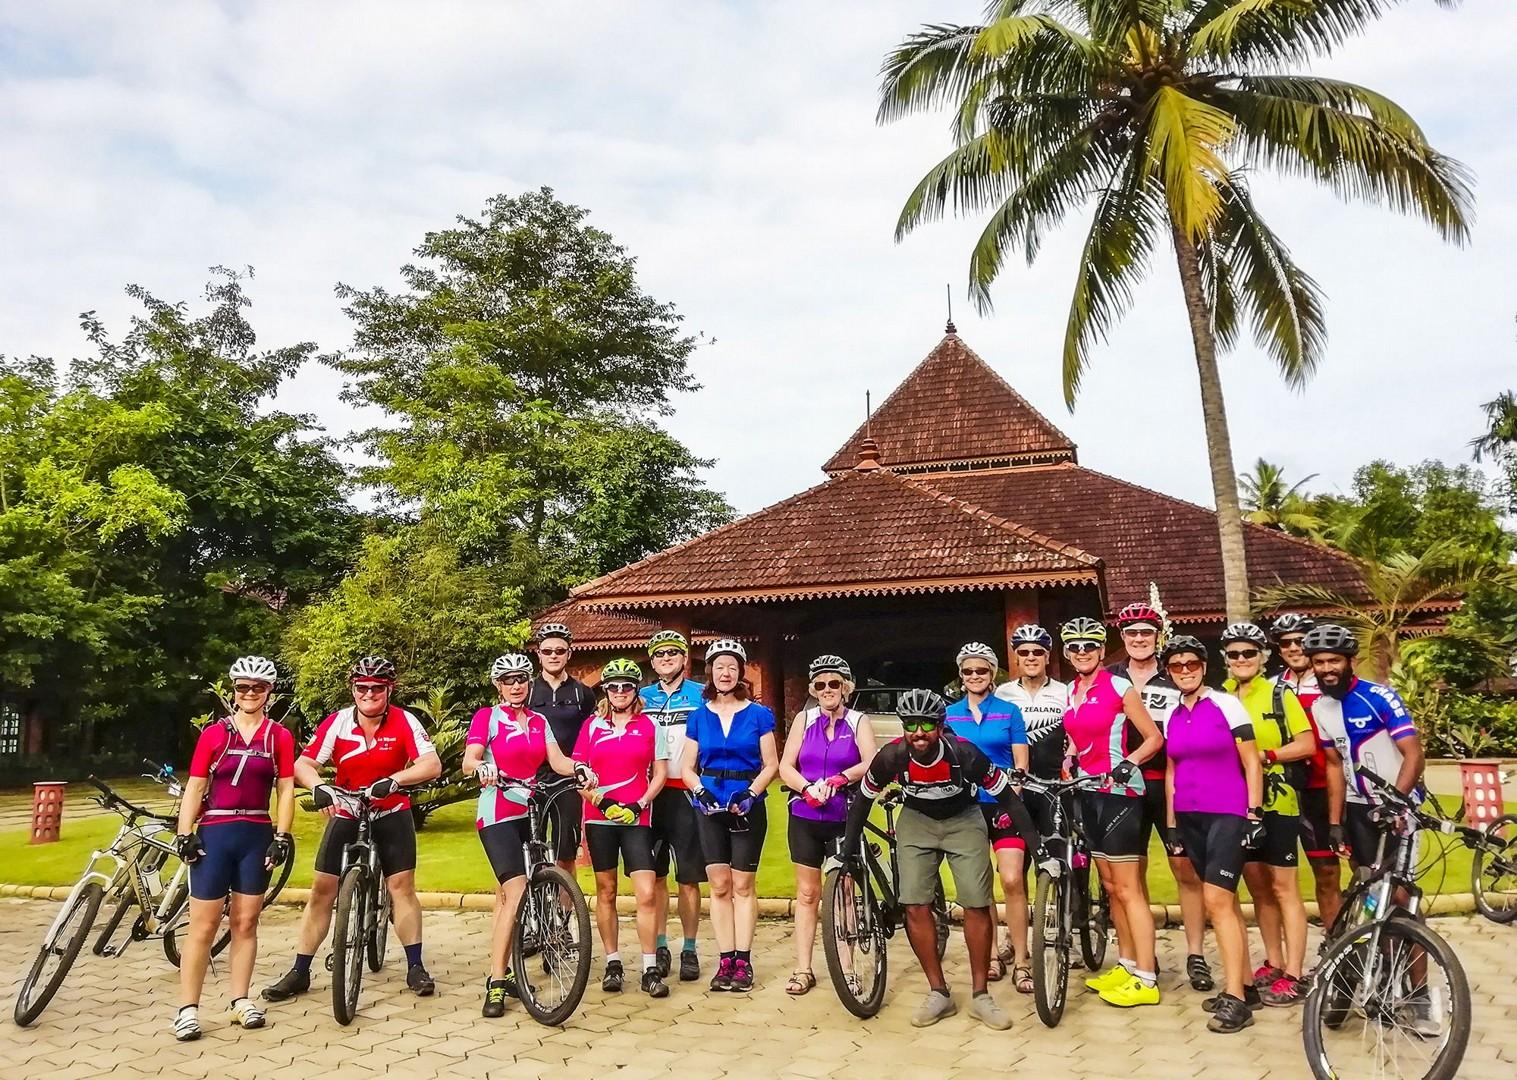 IMG_20181120_082913-2.jpg - India - Classic Kerala - Cycling Adventures